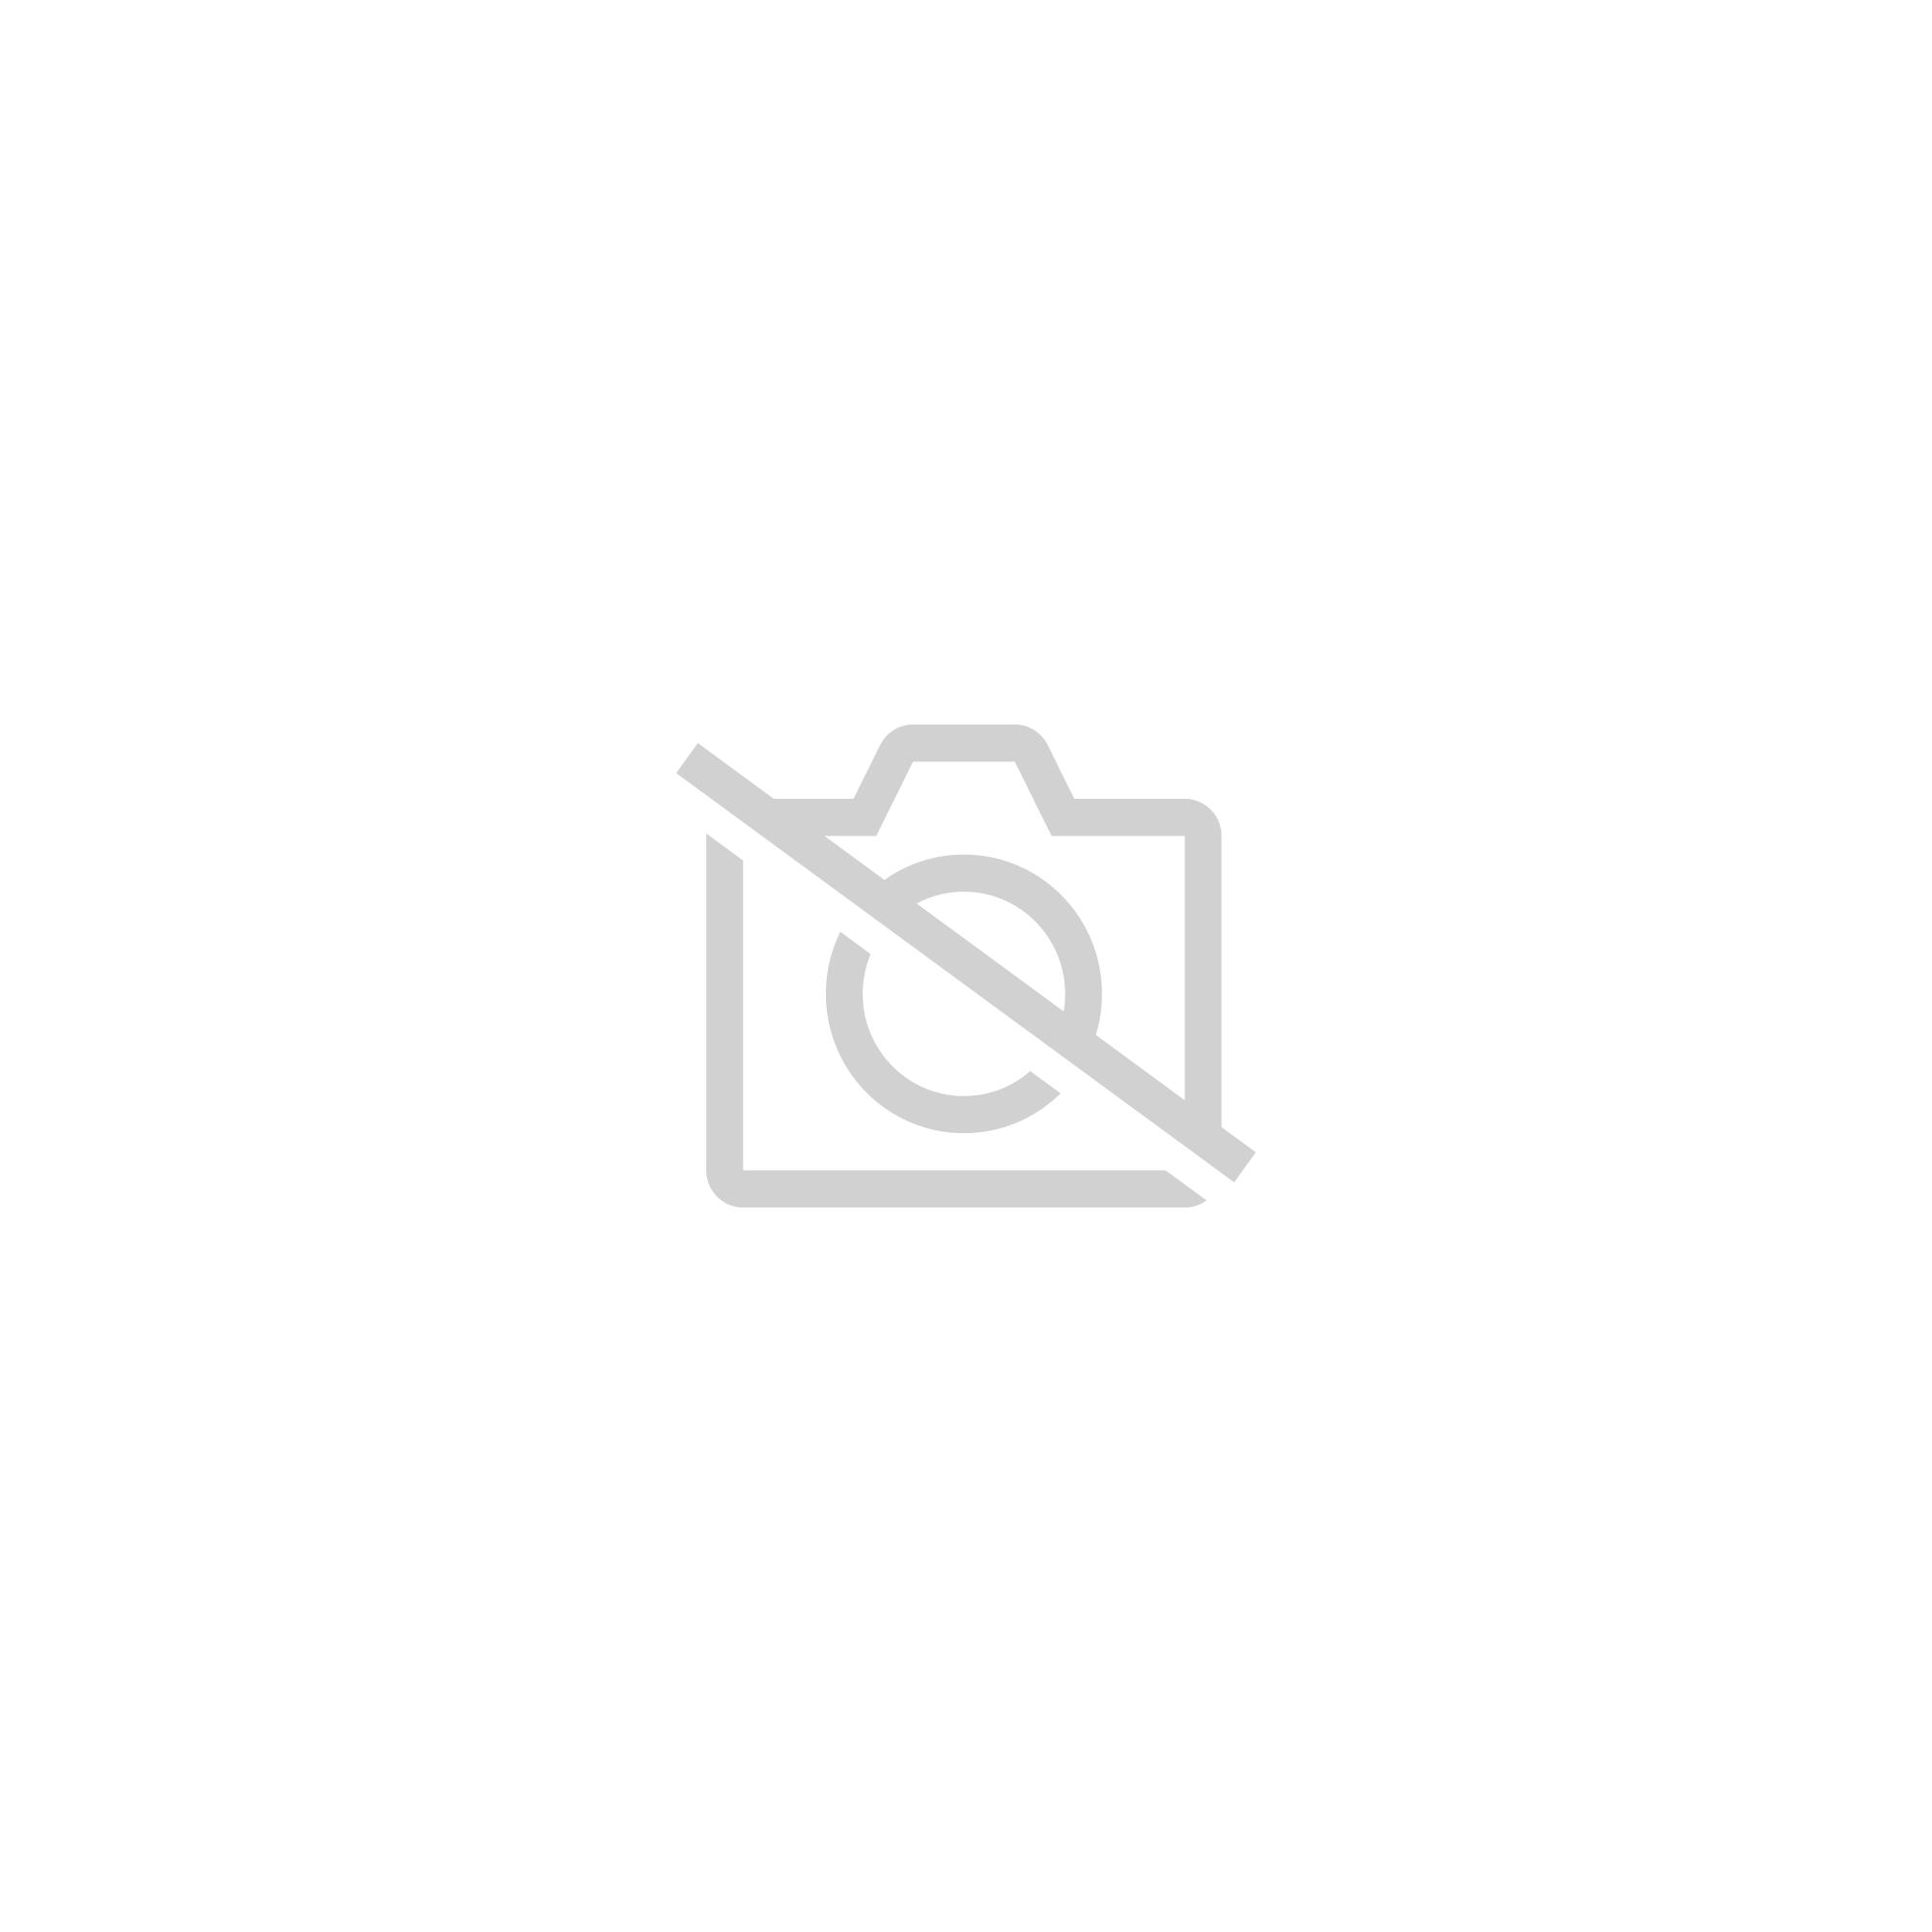 Elica hotte Îlot chrome (85 cm - inox brillant)